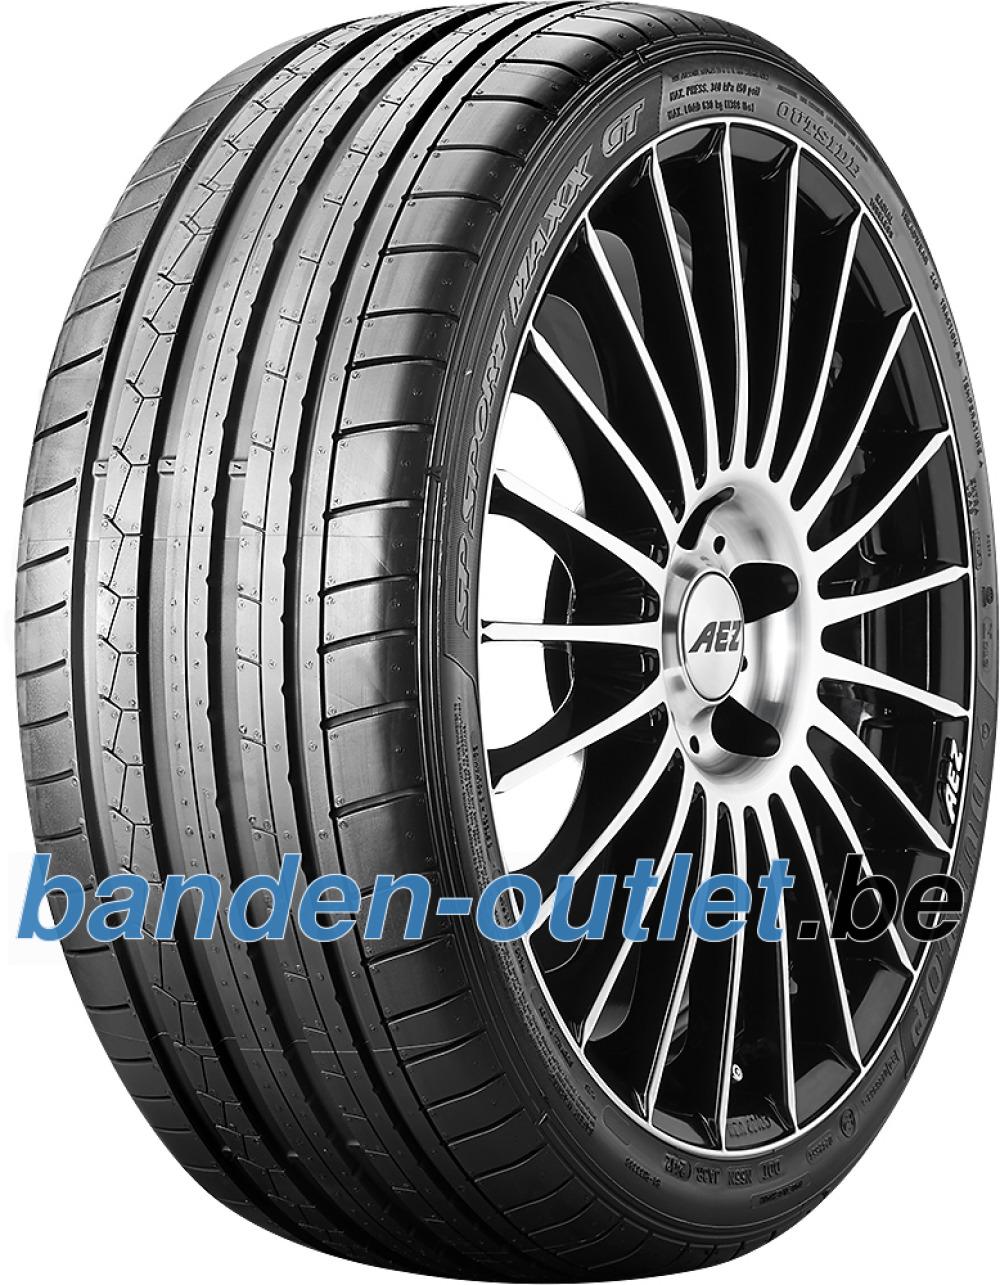 Dunlop SP Sport Maxx GT ( 245/50 ZR18 (104Y) XL J, met velgrandbescherming (MFS) BLT )